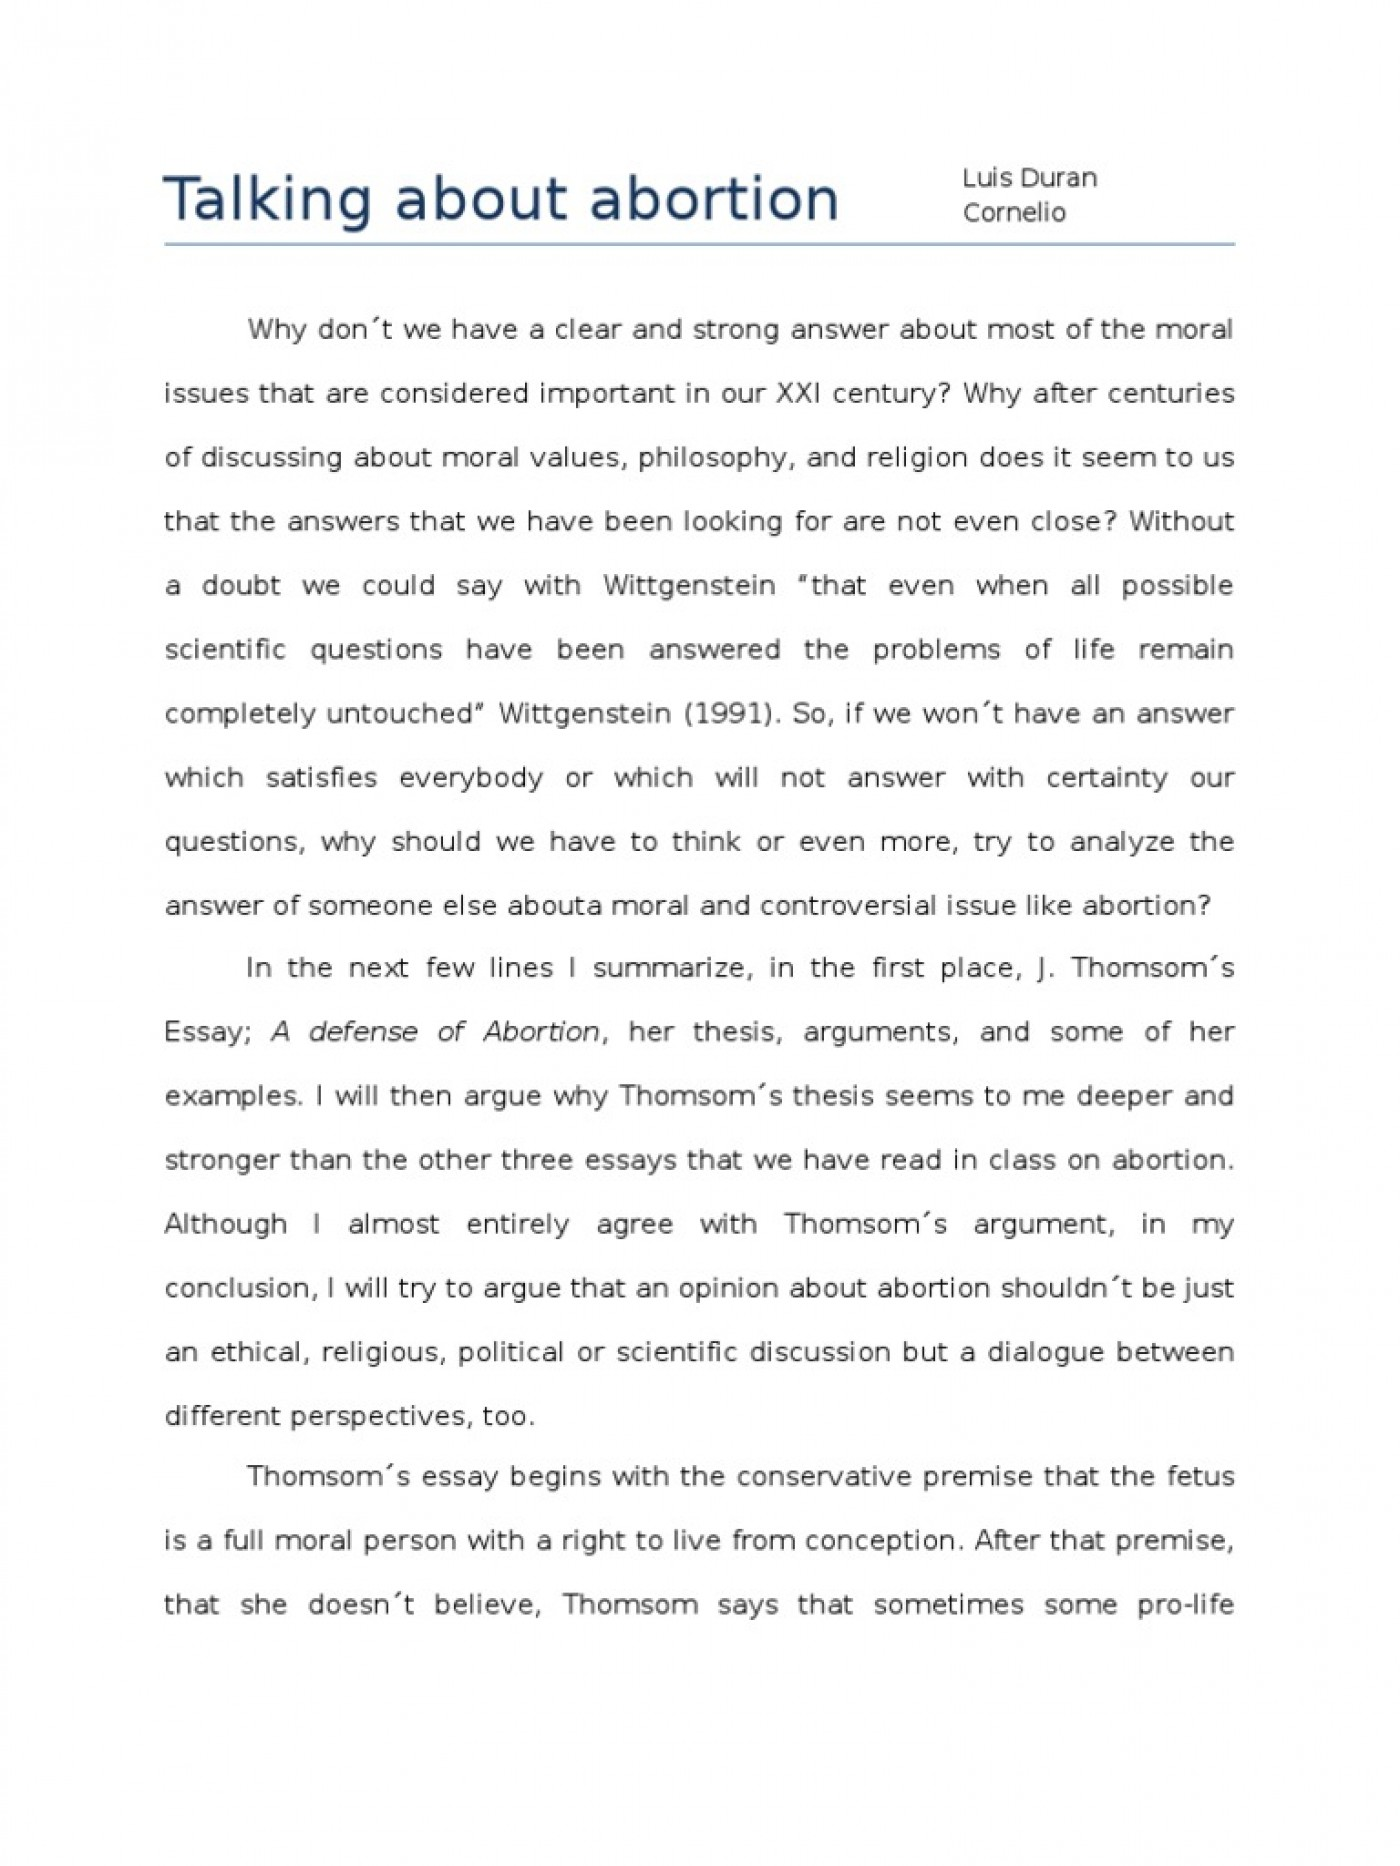 Dissertation binding services sheffield al zip